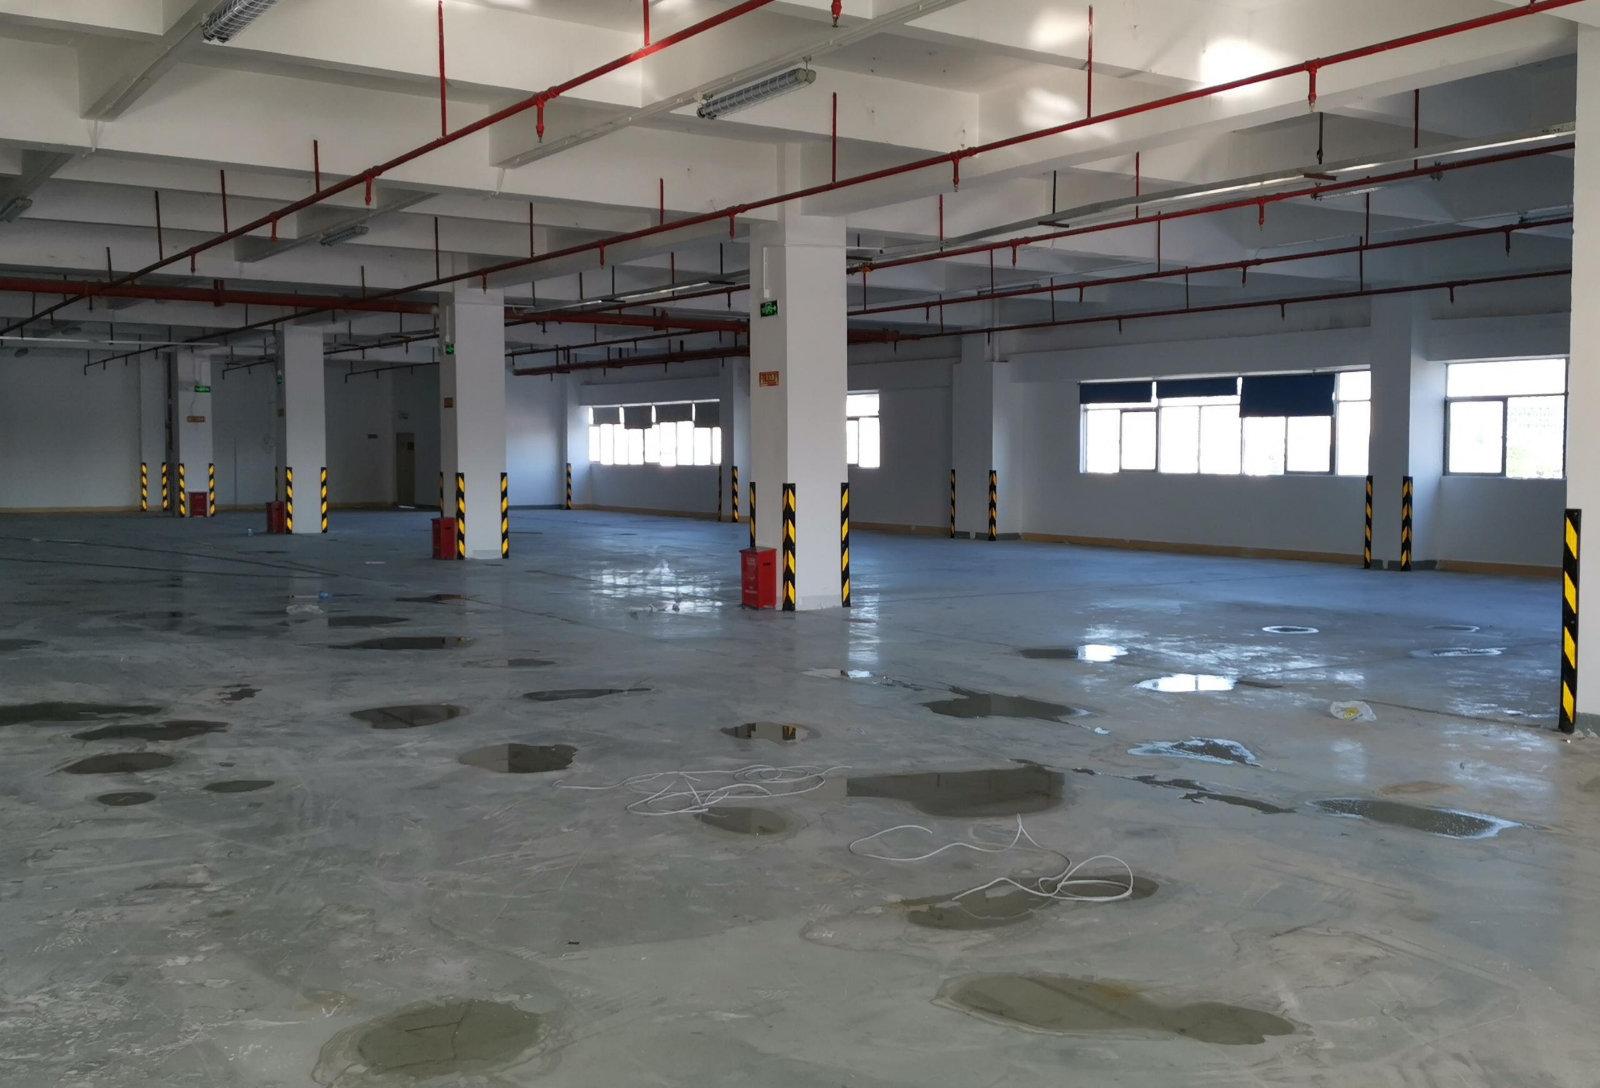 出租宝安机场附近3000千平厂房、仓库